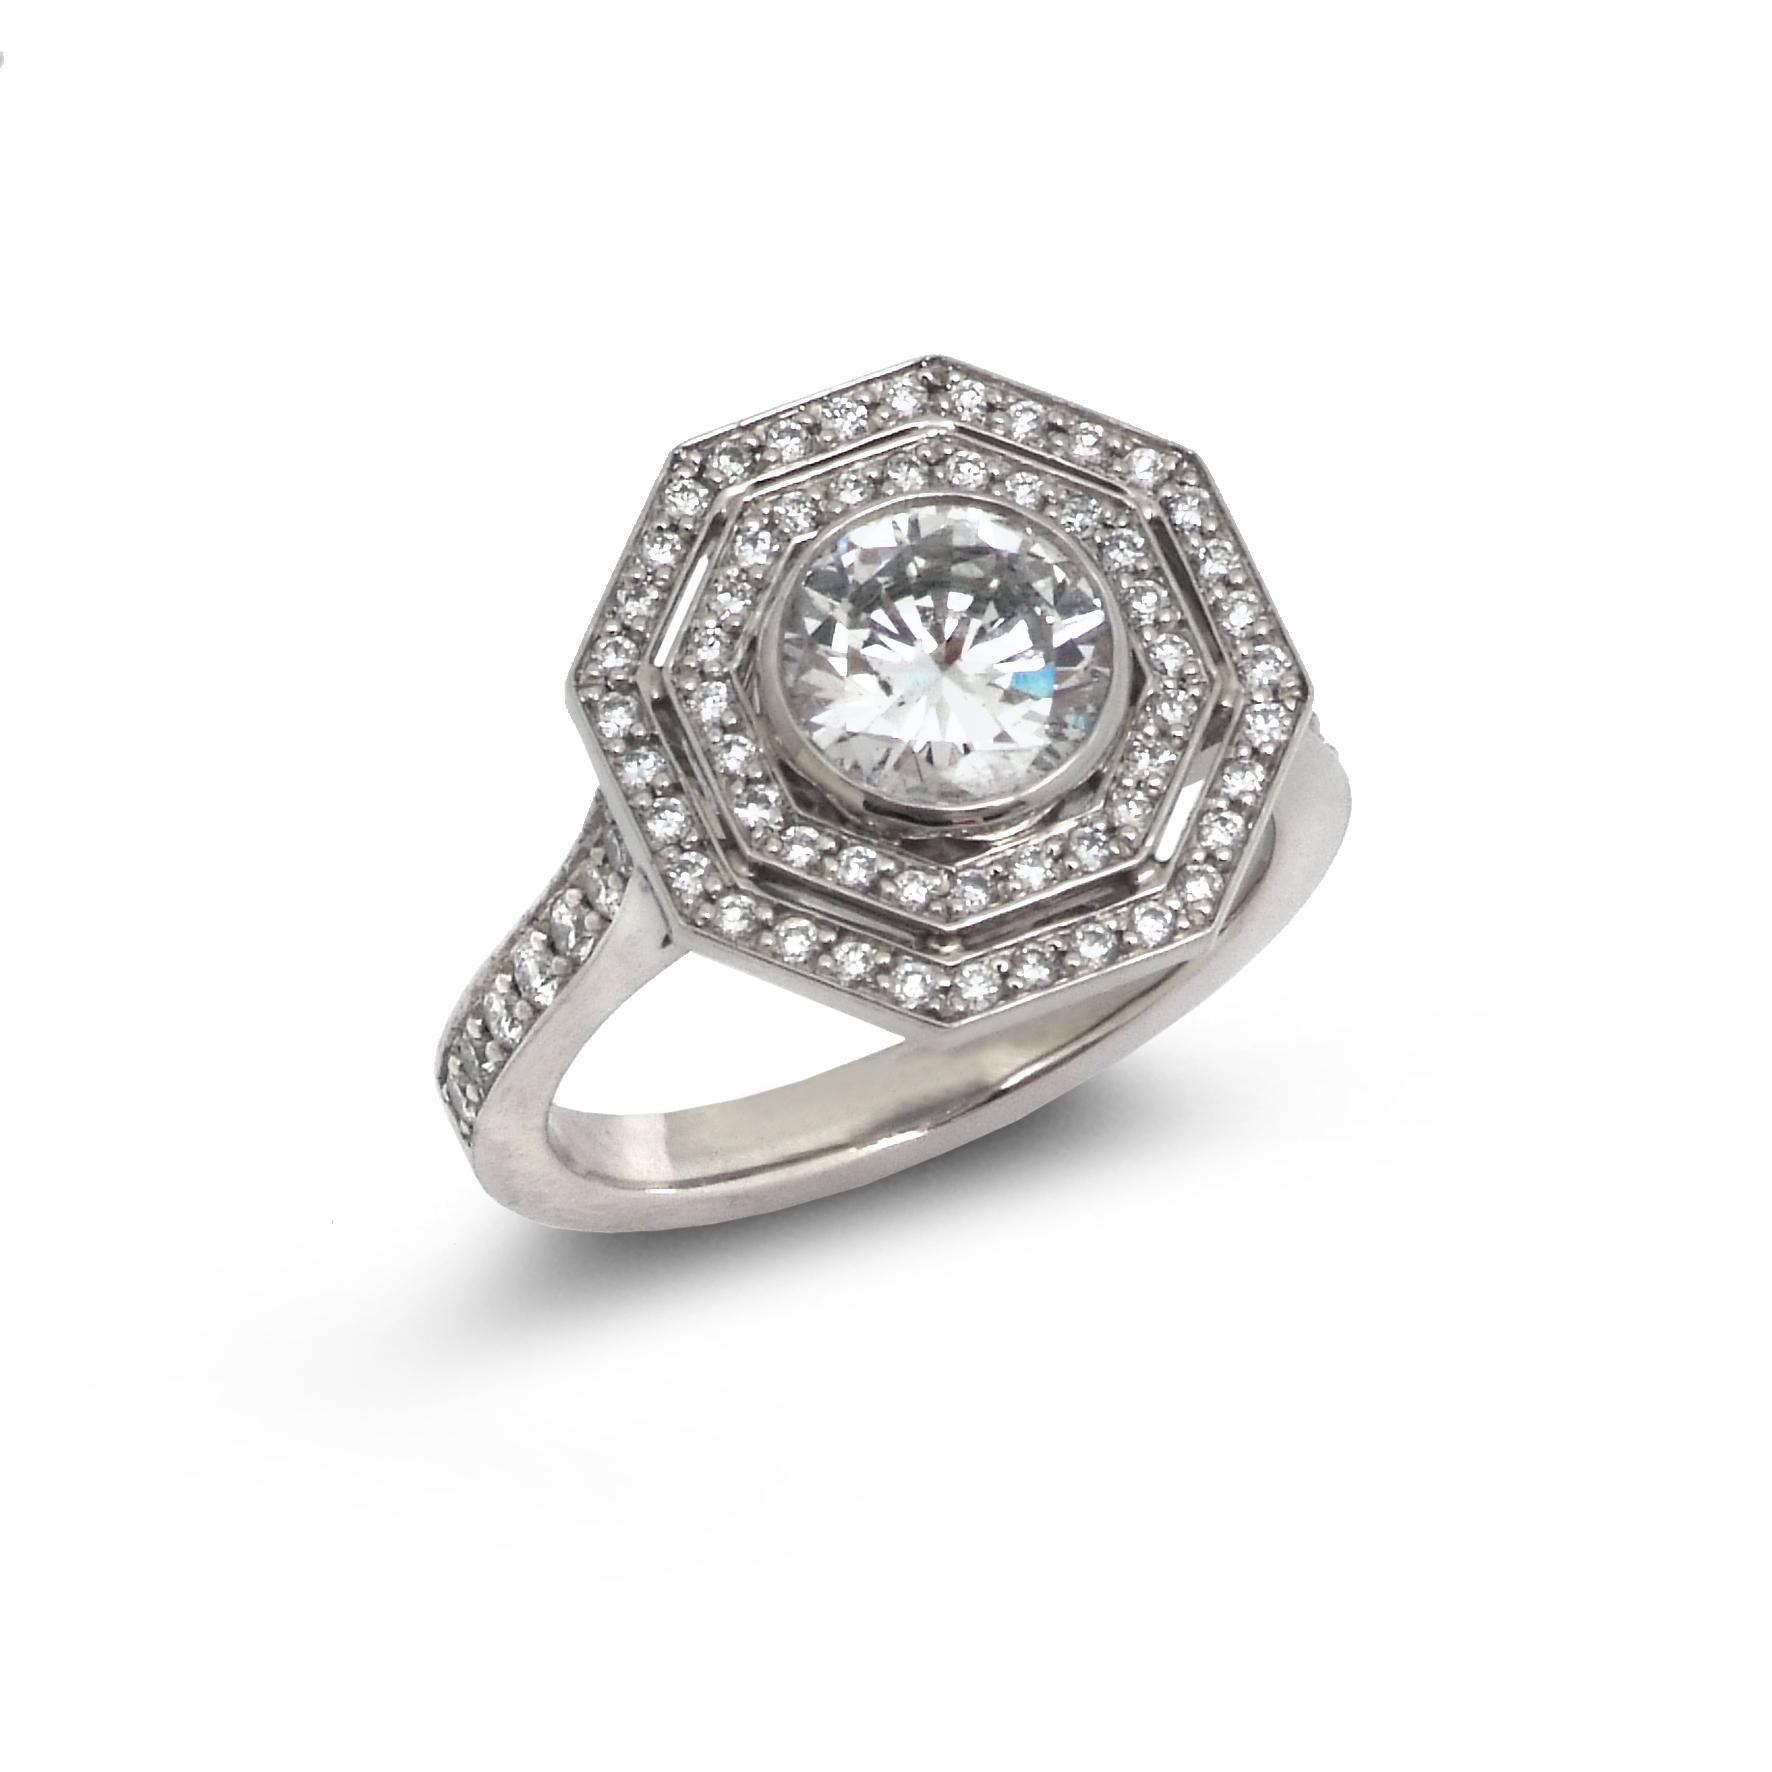 Octagonal diamond target ring top view